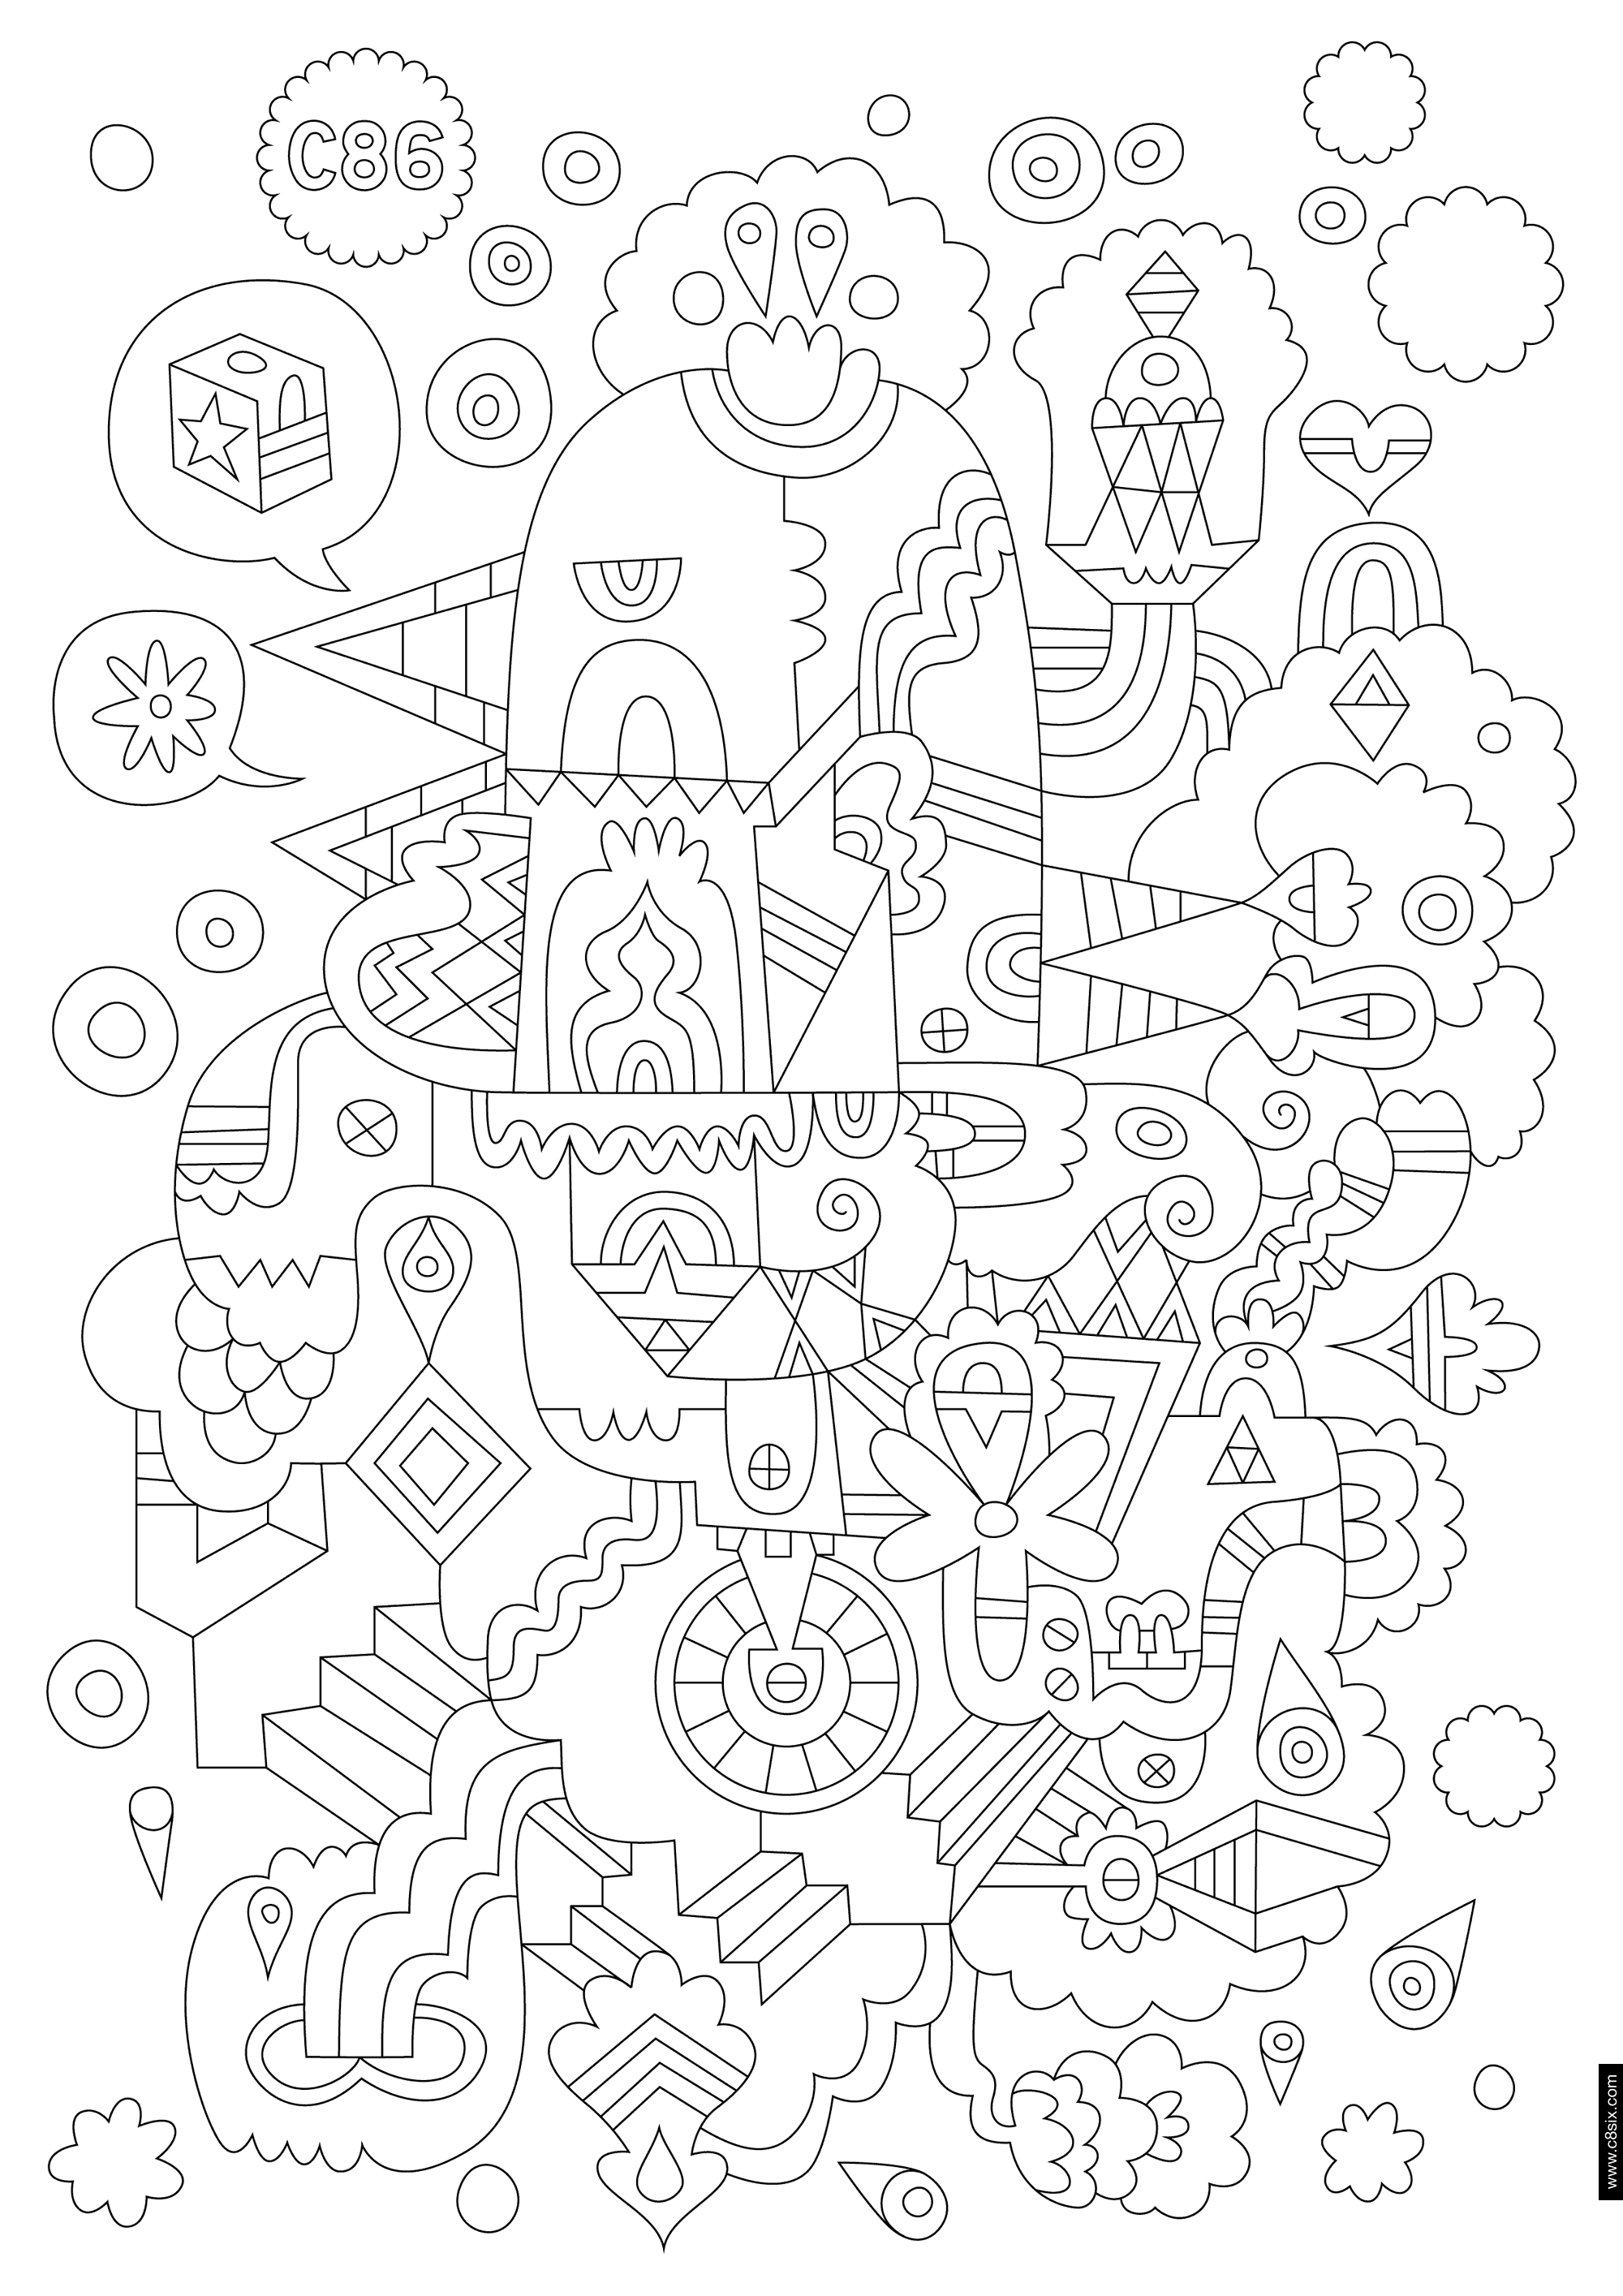 Coloring page   zentangles   Pinterest   Colorear, Pintar y Mandalas